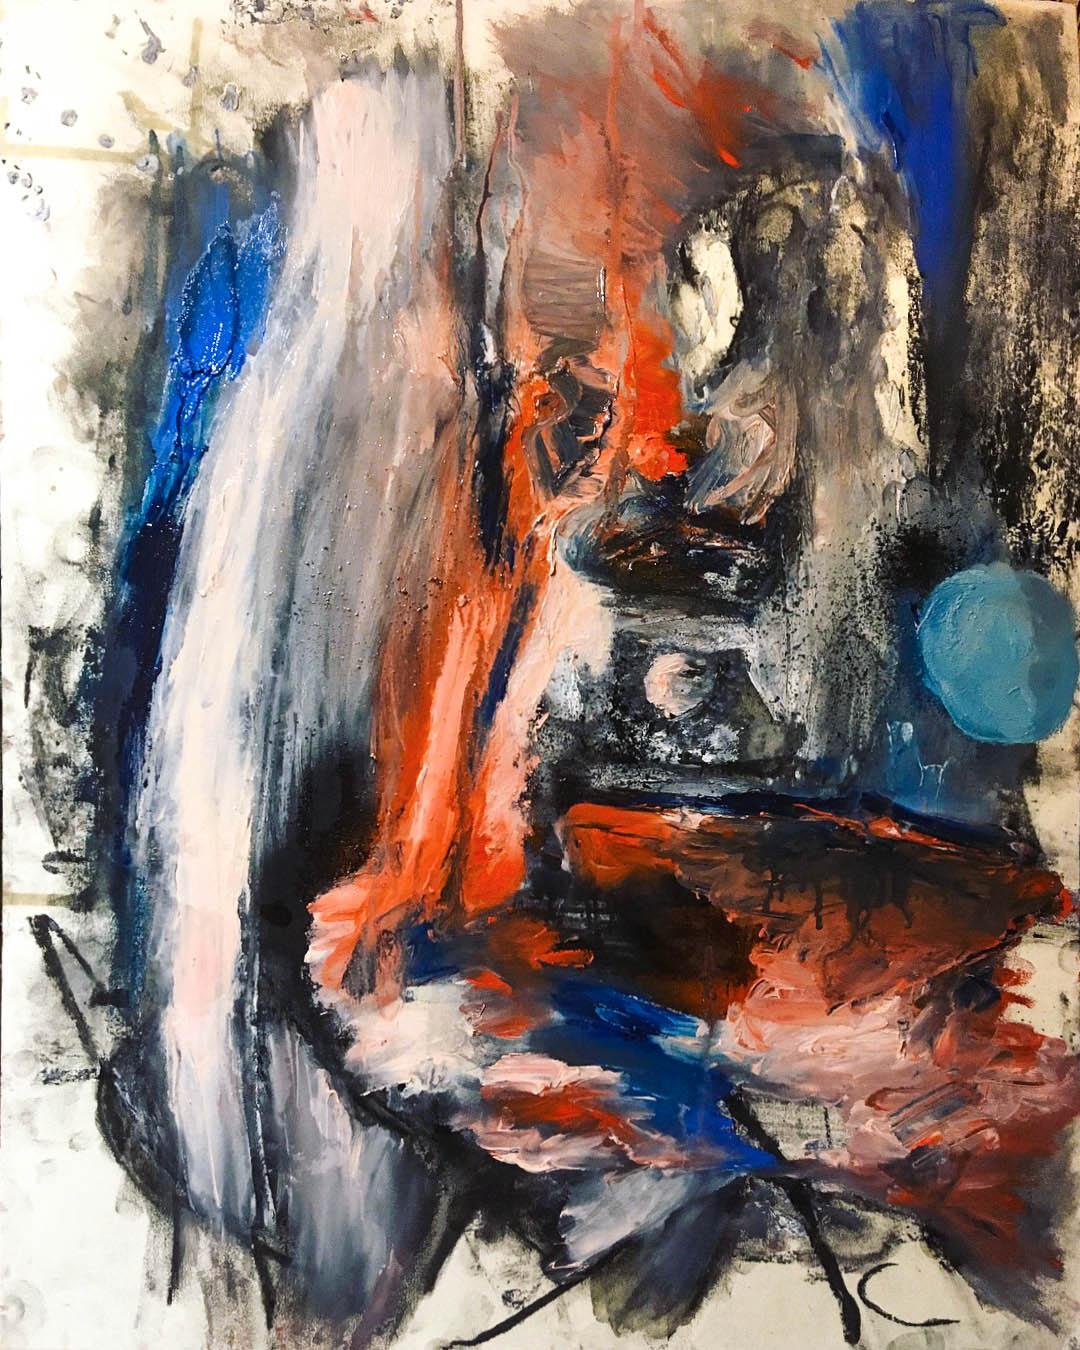 "Moderne Gemälde / Kohle Malerei ""Inhibitor of Fortune and Tolerance"", Tilarids, 50x65, Mischtechniken mit Kohle und Ölfarben/Oil with coal on paper, 03.2018"